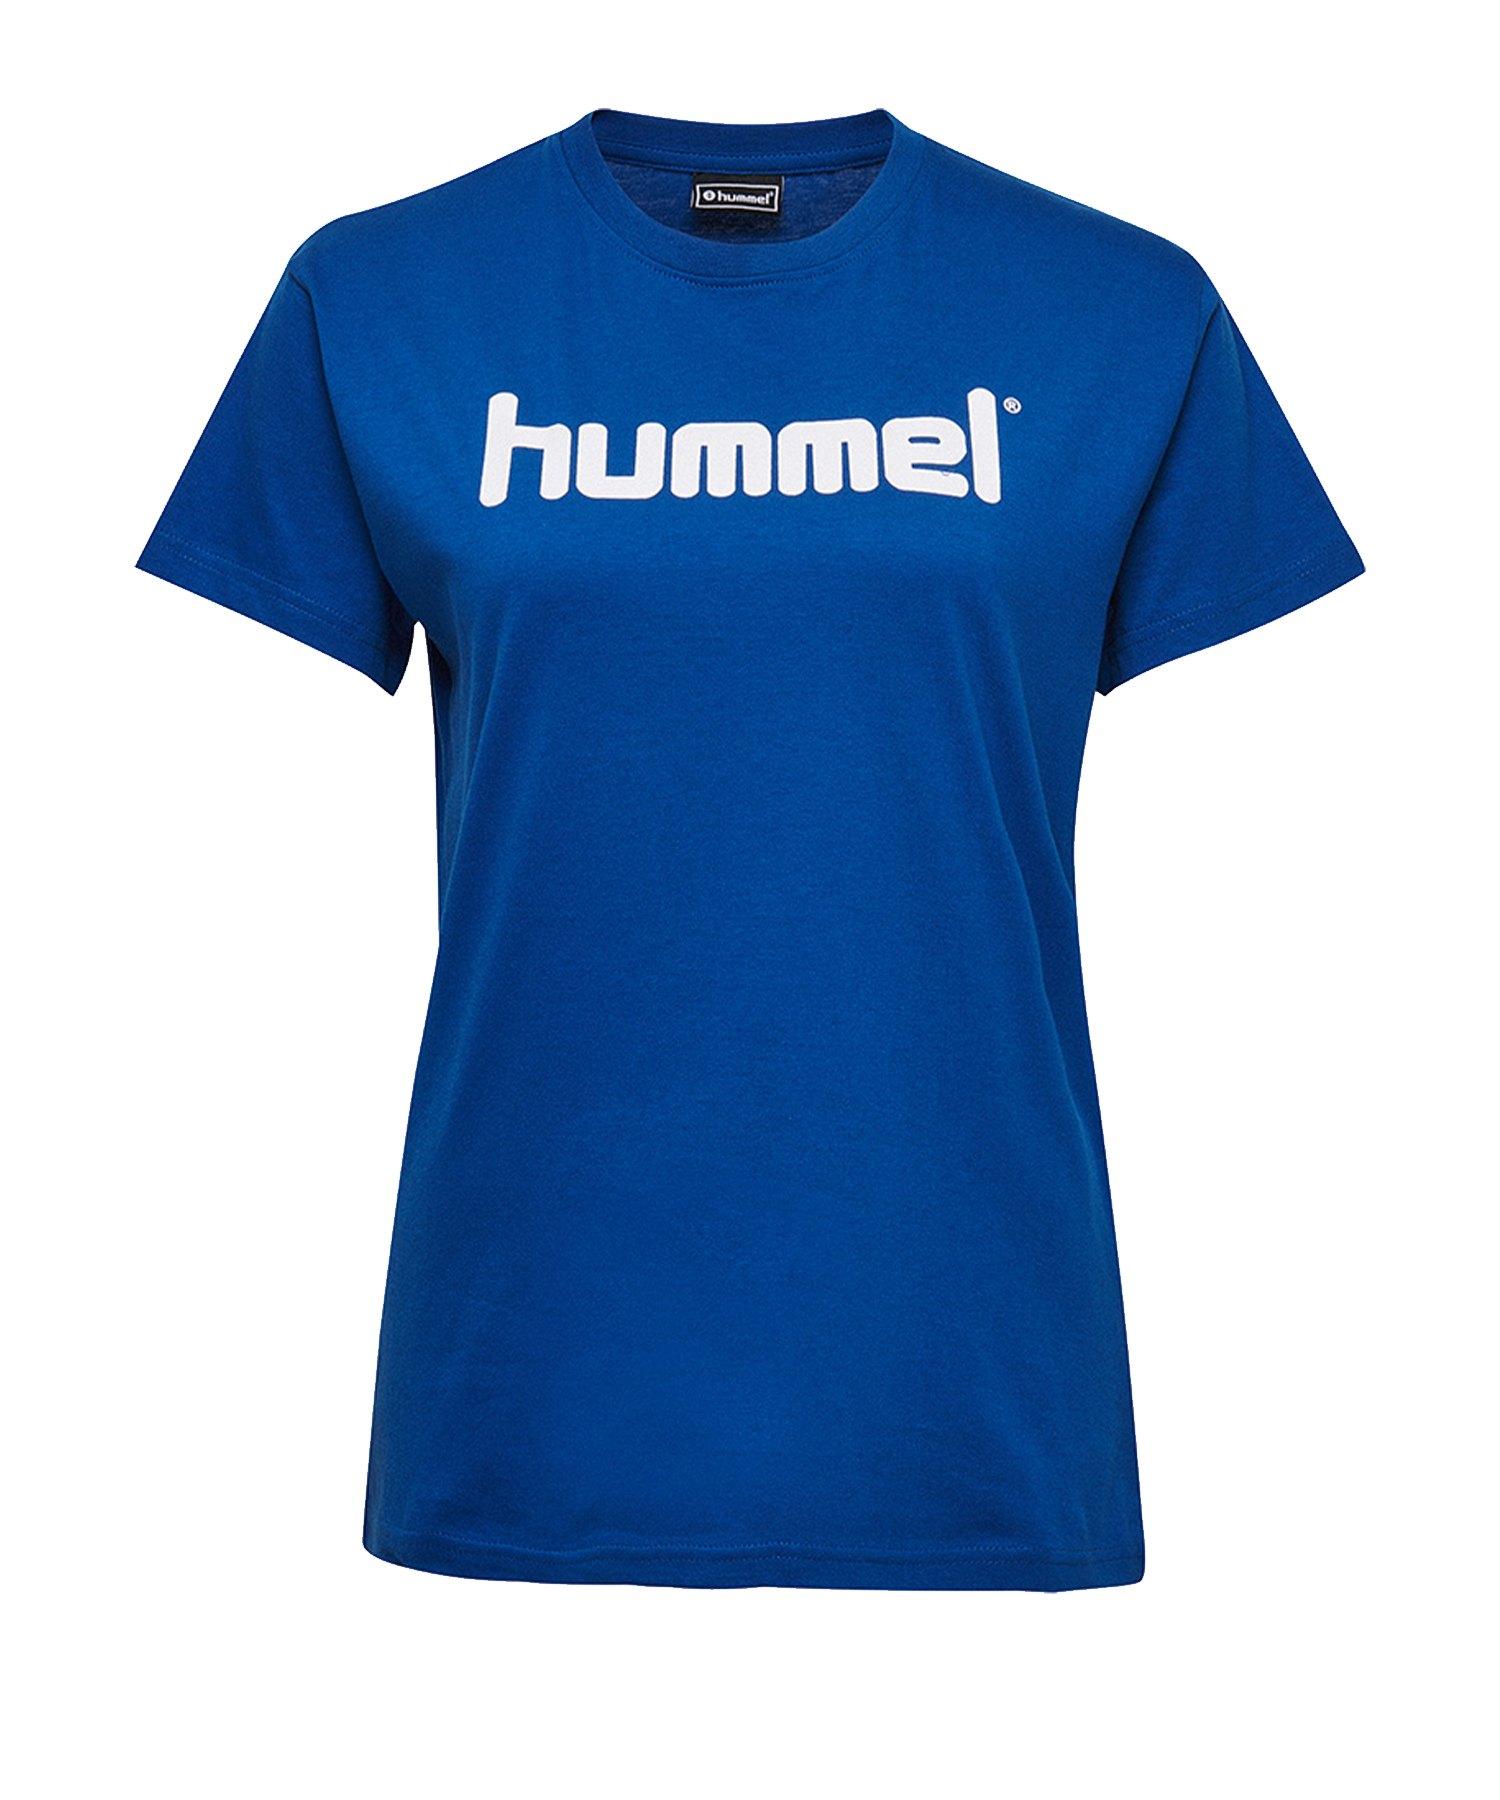 Hummel Cotton T-Shirt Logo Damen Blau F7045 - Blau